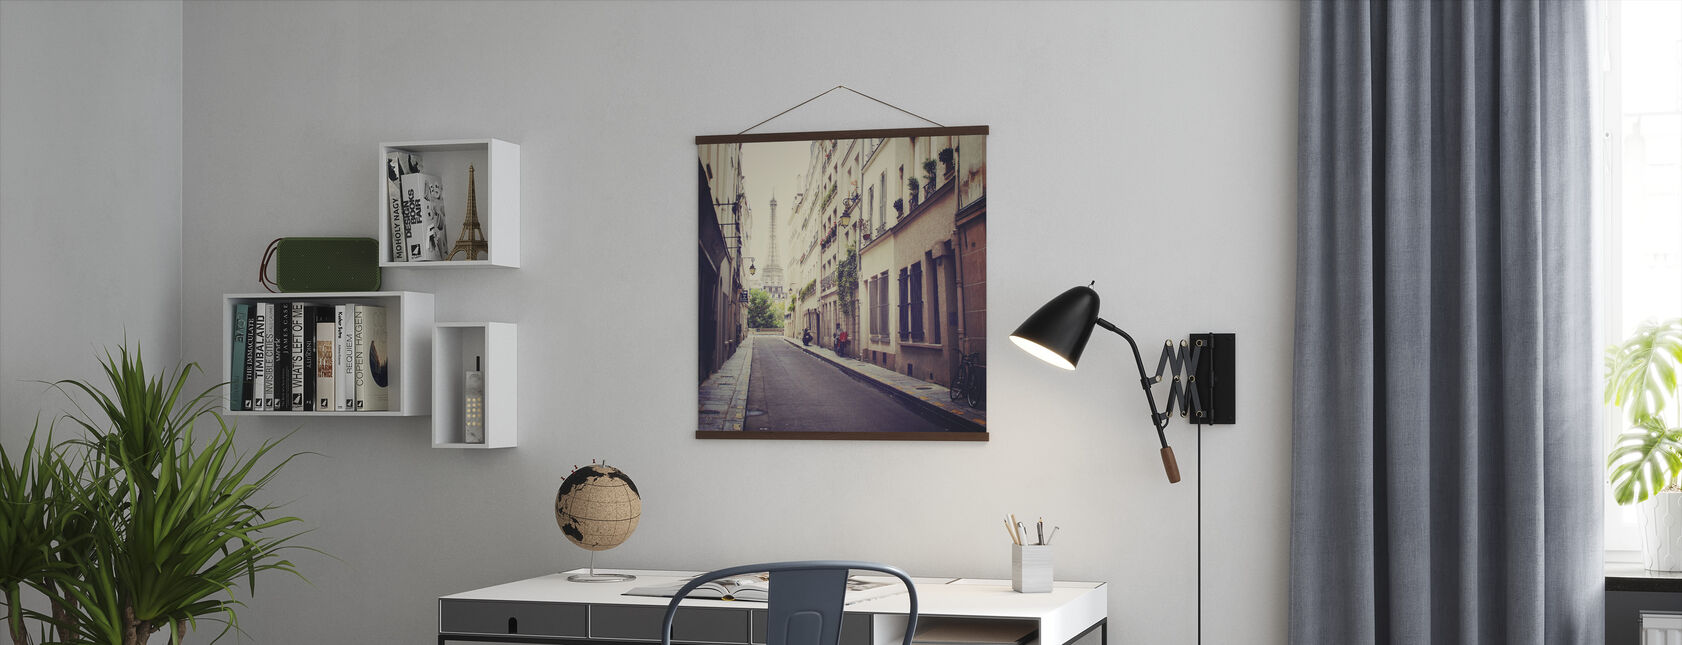 Eiffeltårnet - Plakat - Kontor